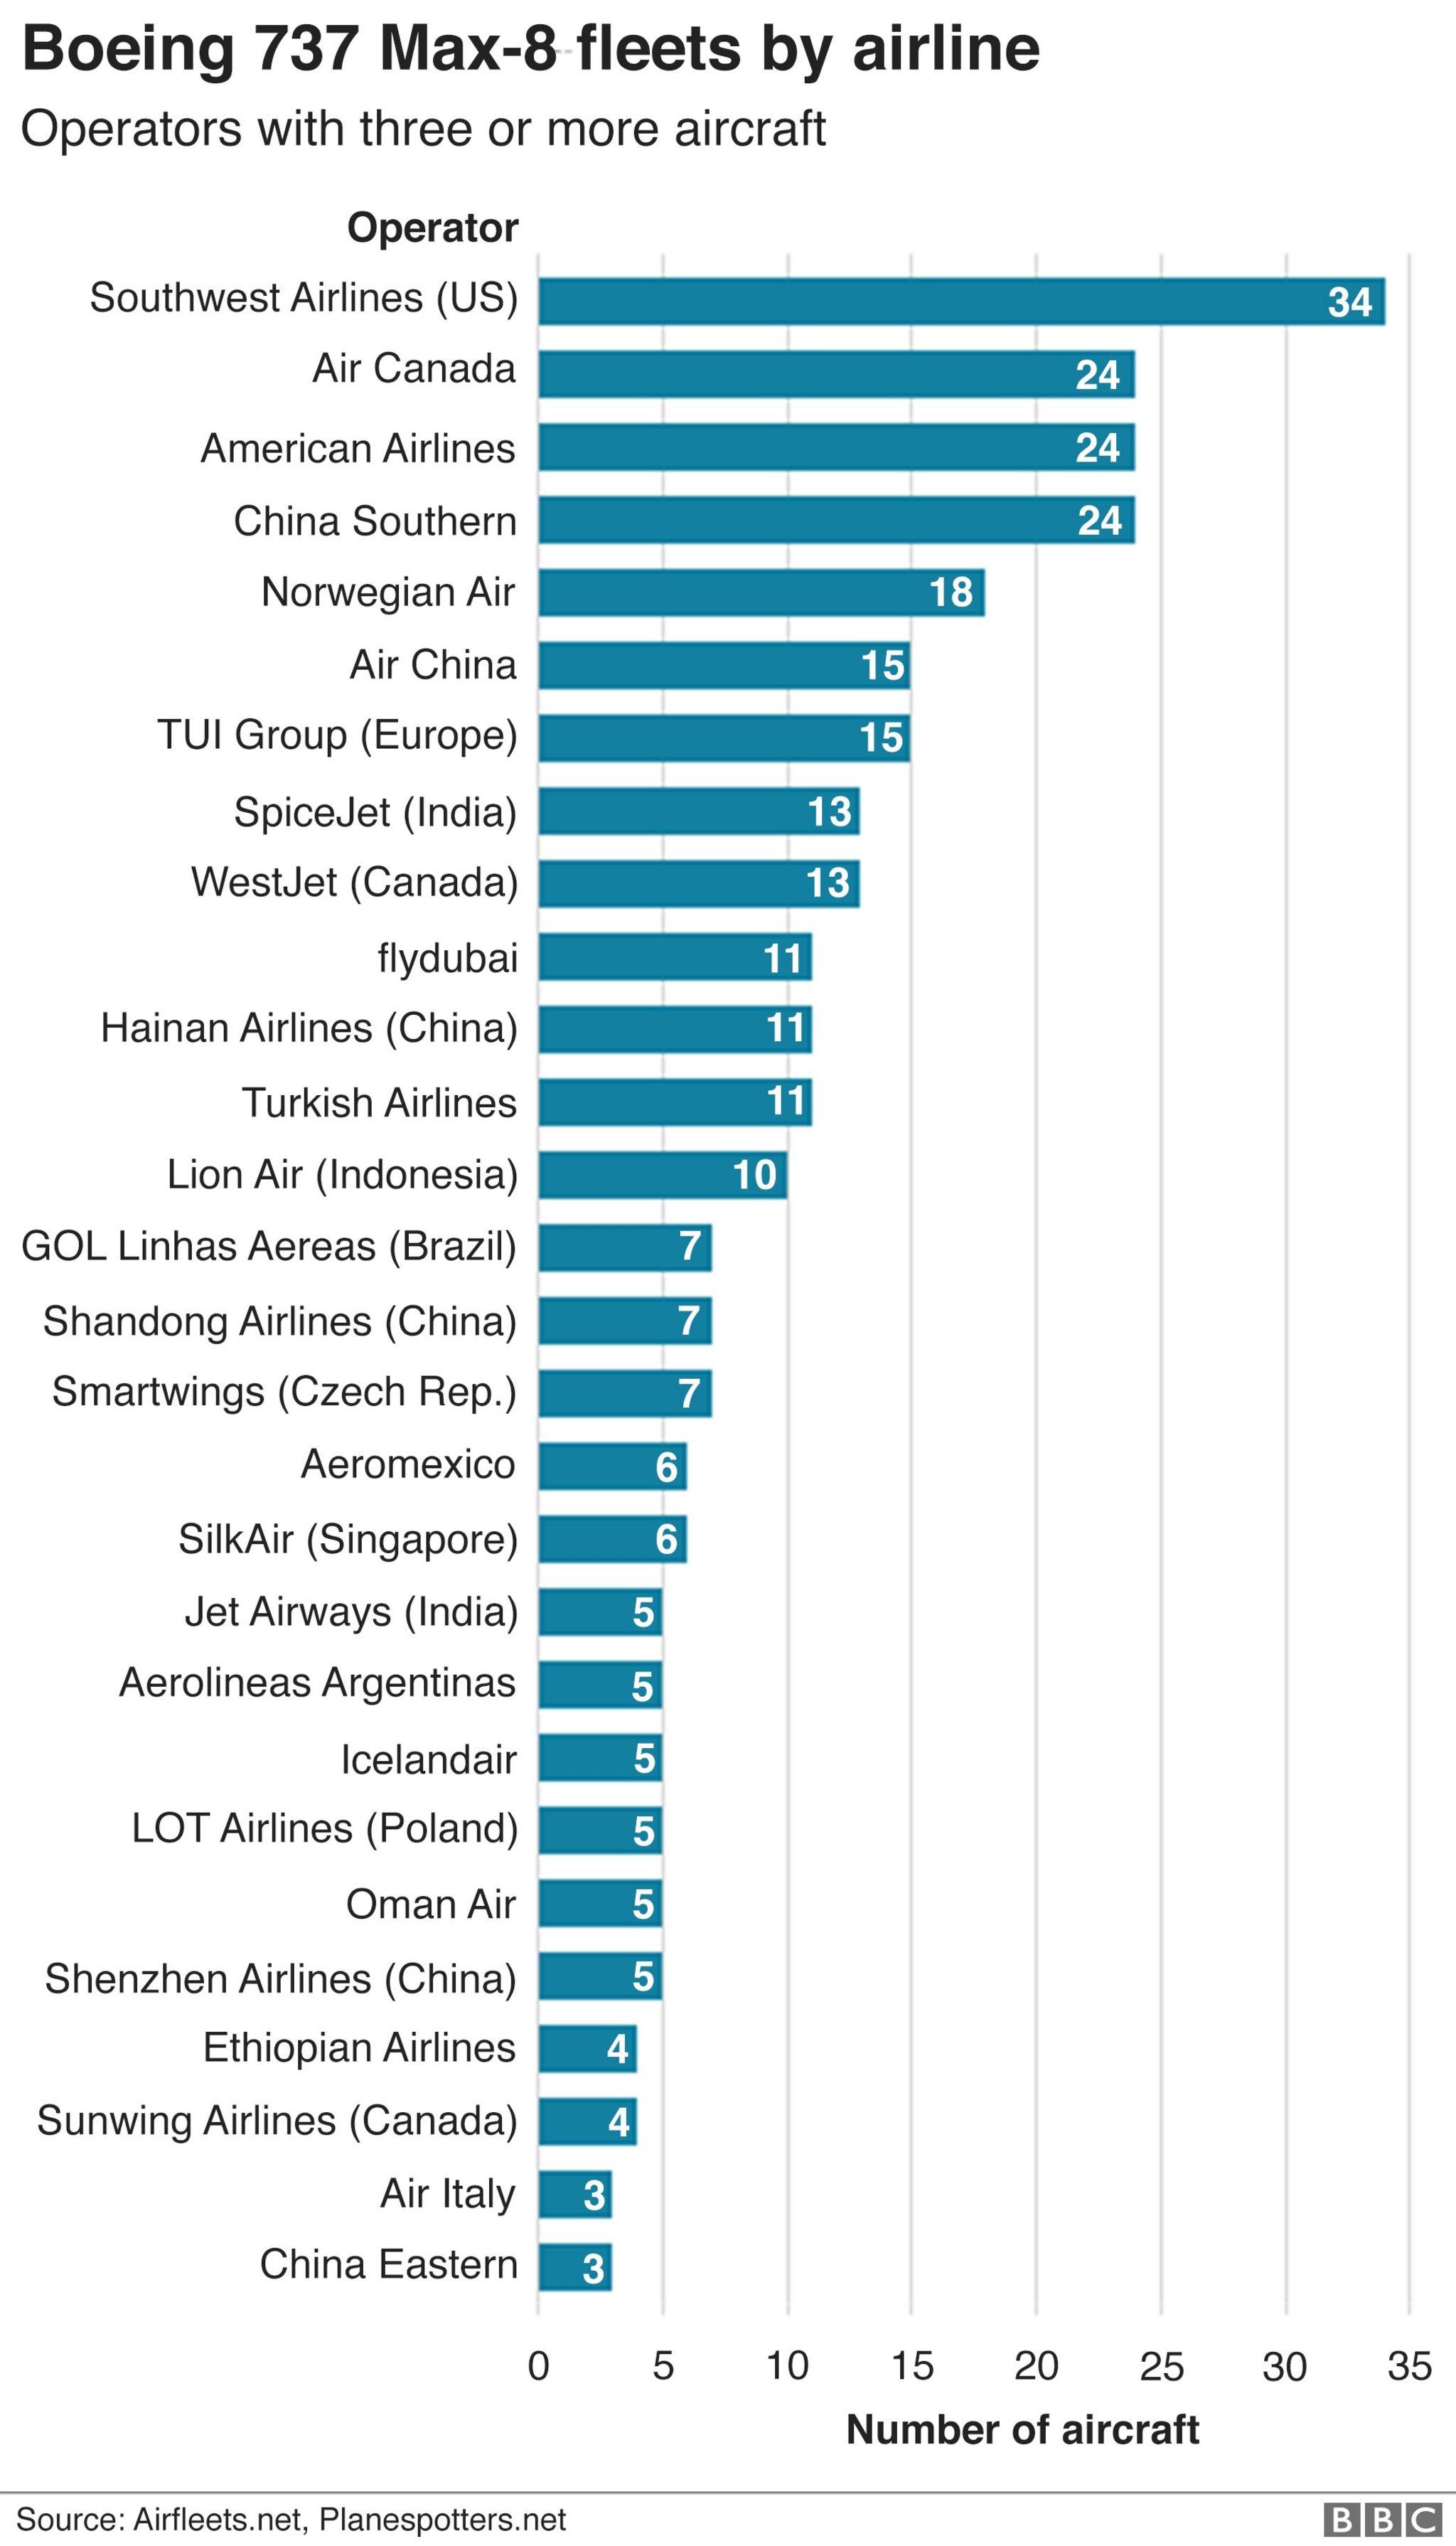 Graphic: Main Boeing 737 Max-8 operators